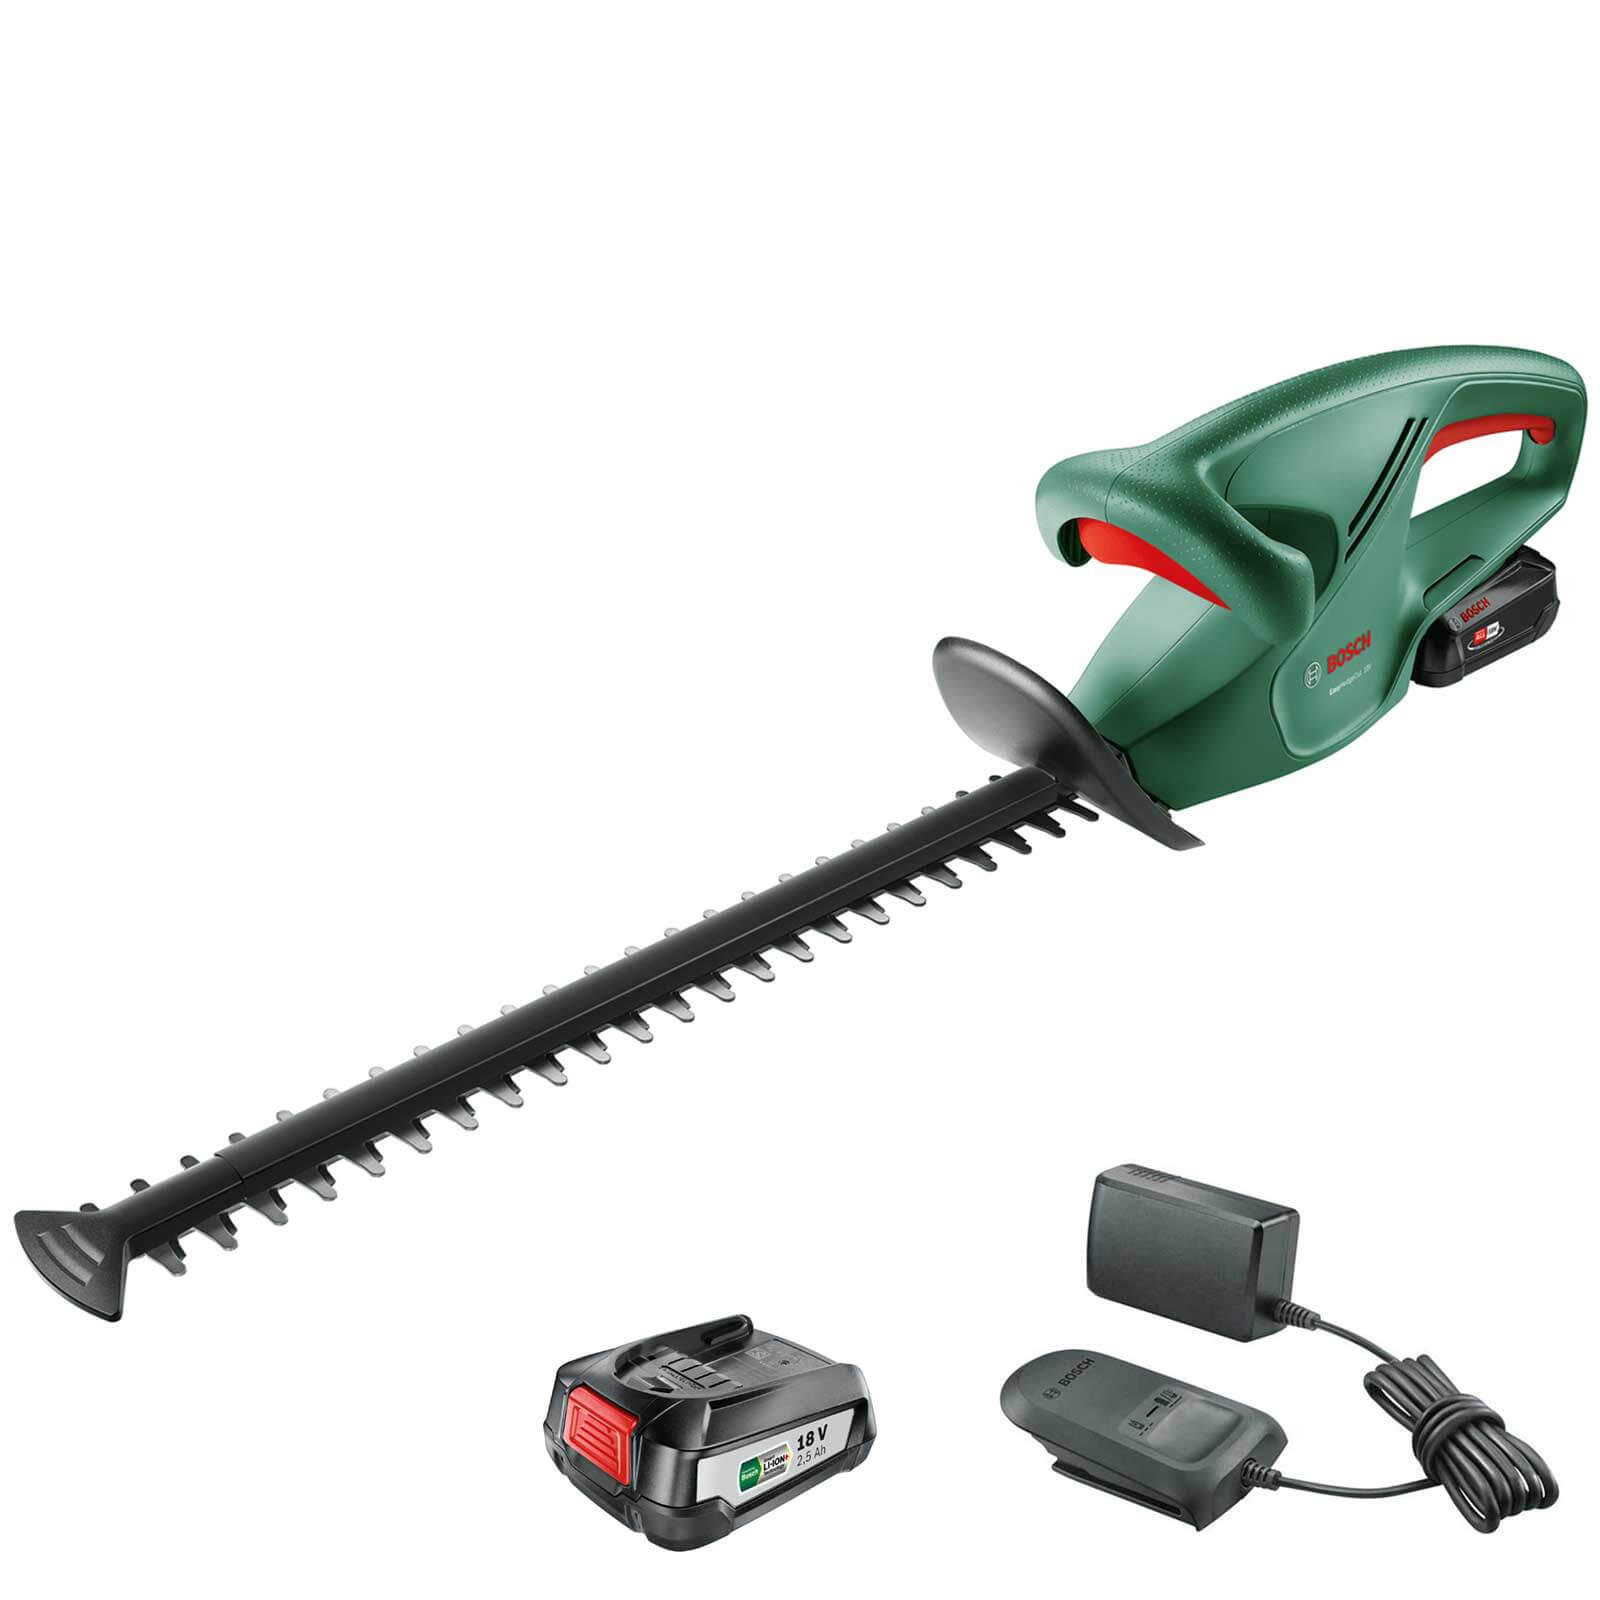 Bosch EASYHEDGECUT 18-45 18v Cordless Hedge Trimmer 450mm 2 x 2.5ah Li-ion Charger